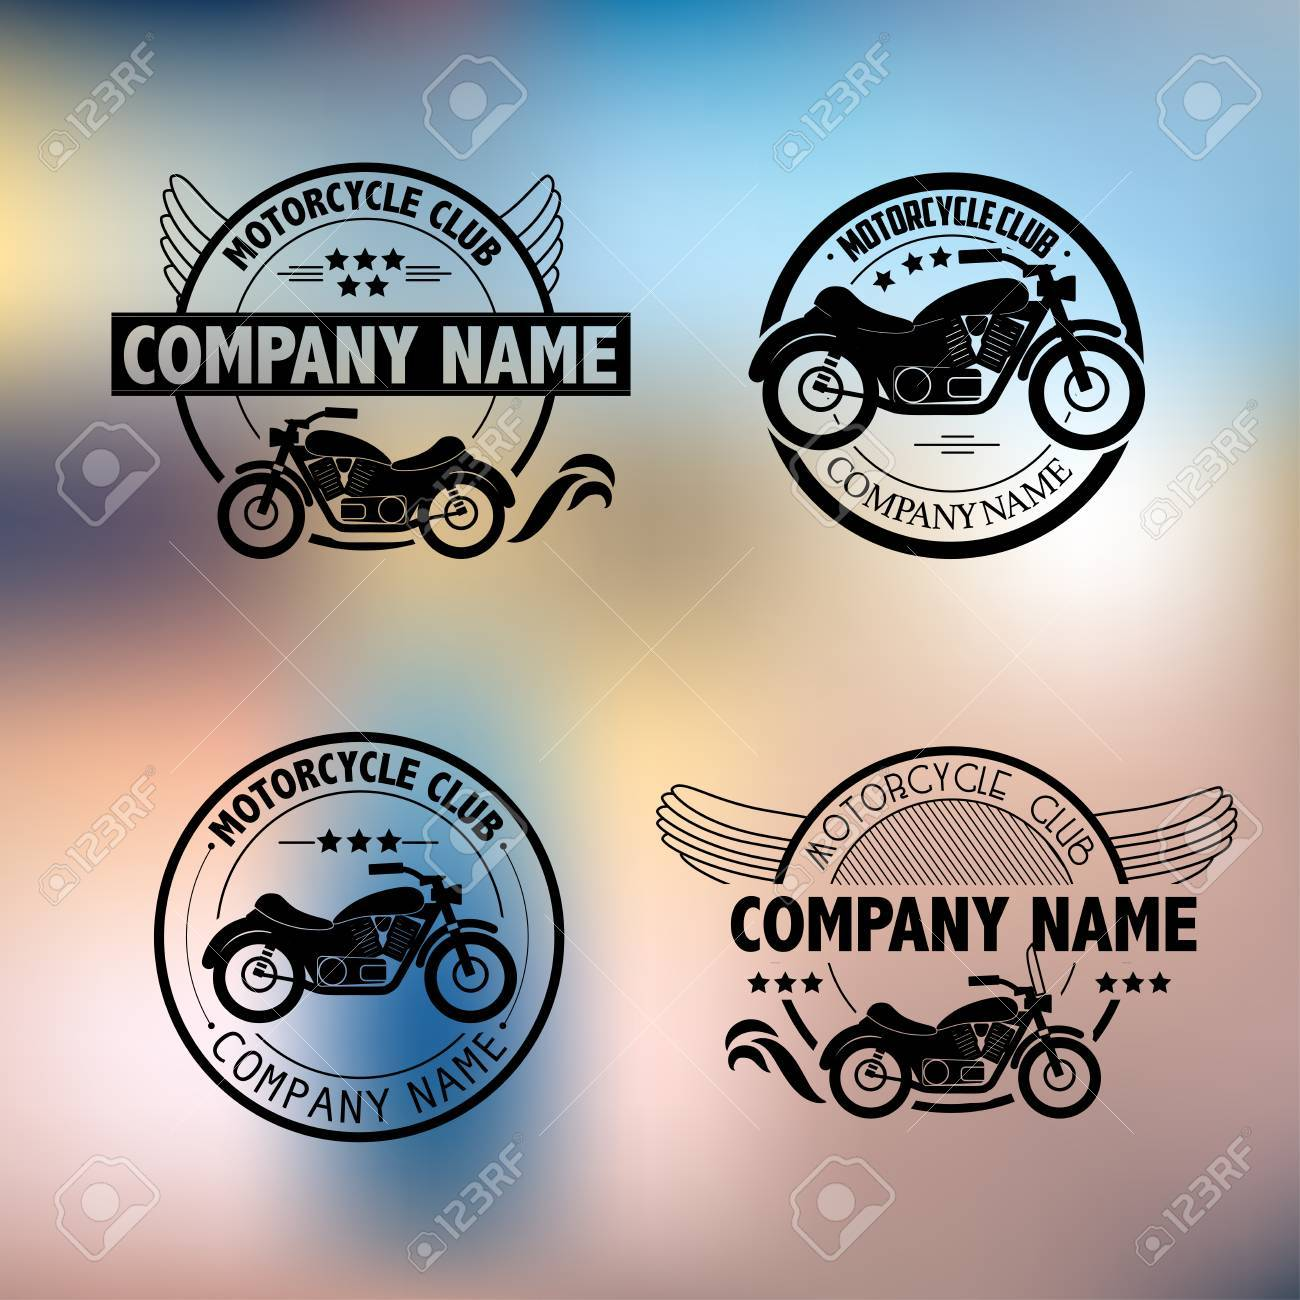 Vector Motorcycle Club Icon Template. Royalty Free Cliparts, Vectors ...